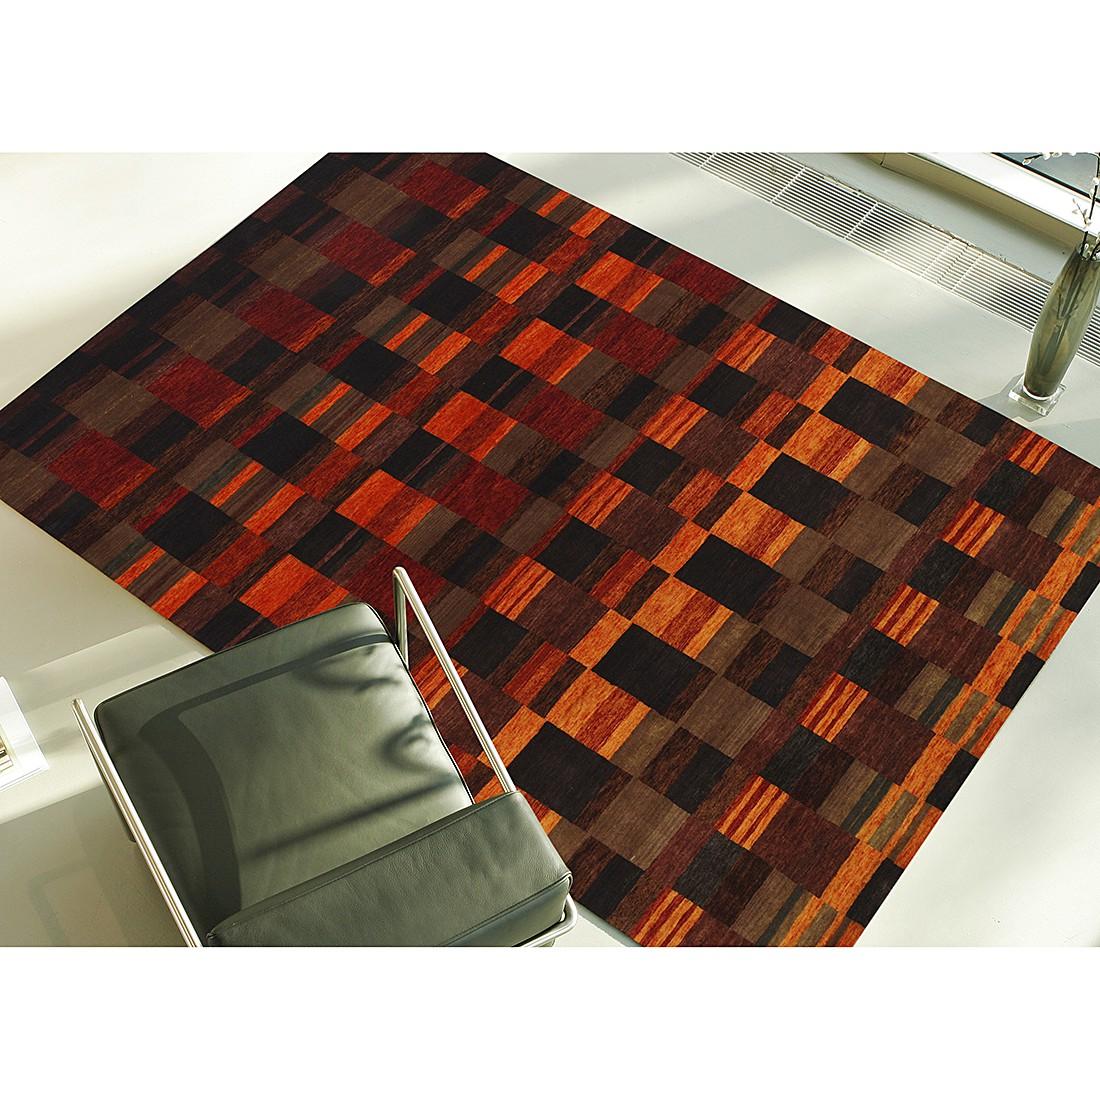 Teppich Lombard – Wolle/Rot – 80 x 250 cm, Talis Teppiche online bestellen